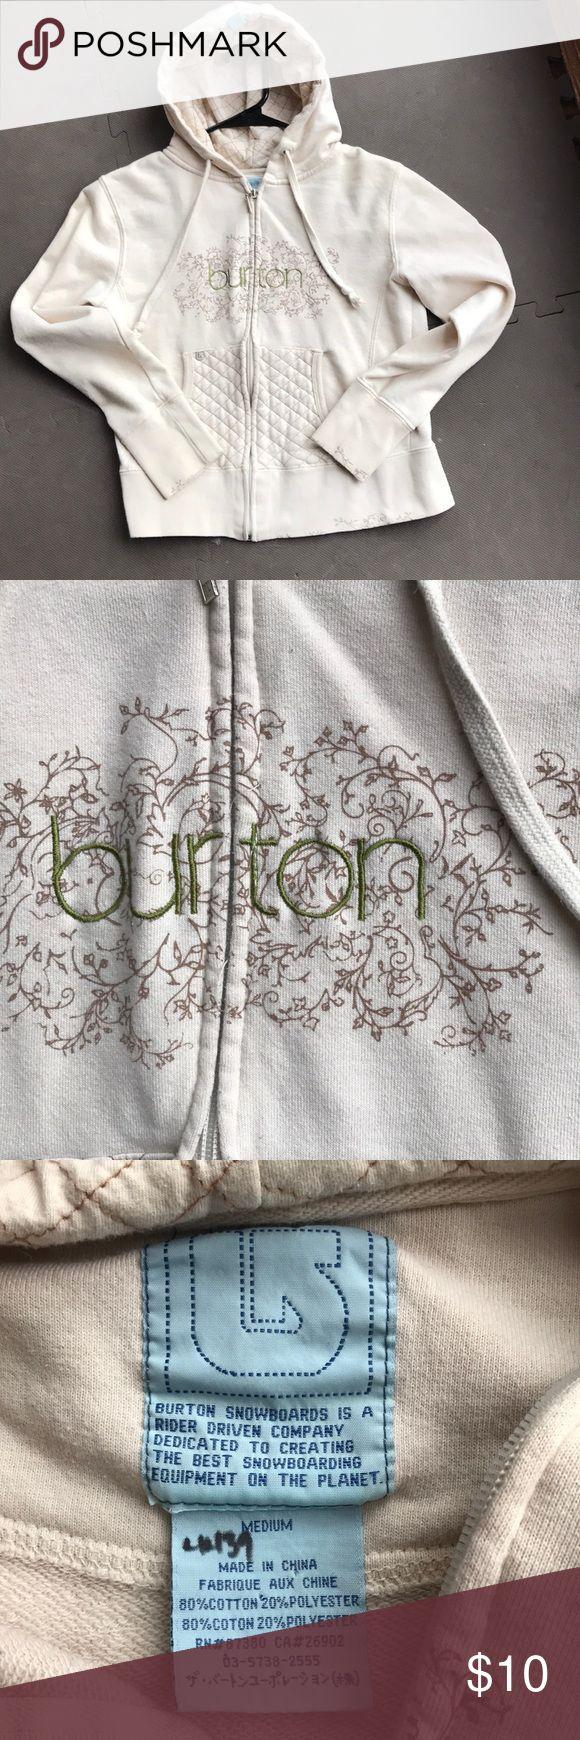 Burton hoodie Women's medium cream colored Burton hoodie in great condition. Inked numbers on tag from previous sale. See photos. Burton Tops Sweatshirts & Hoodies